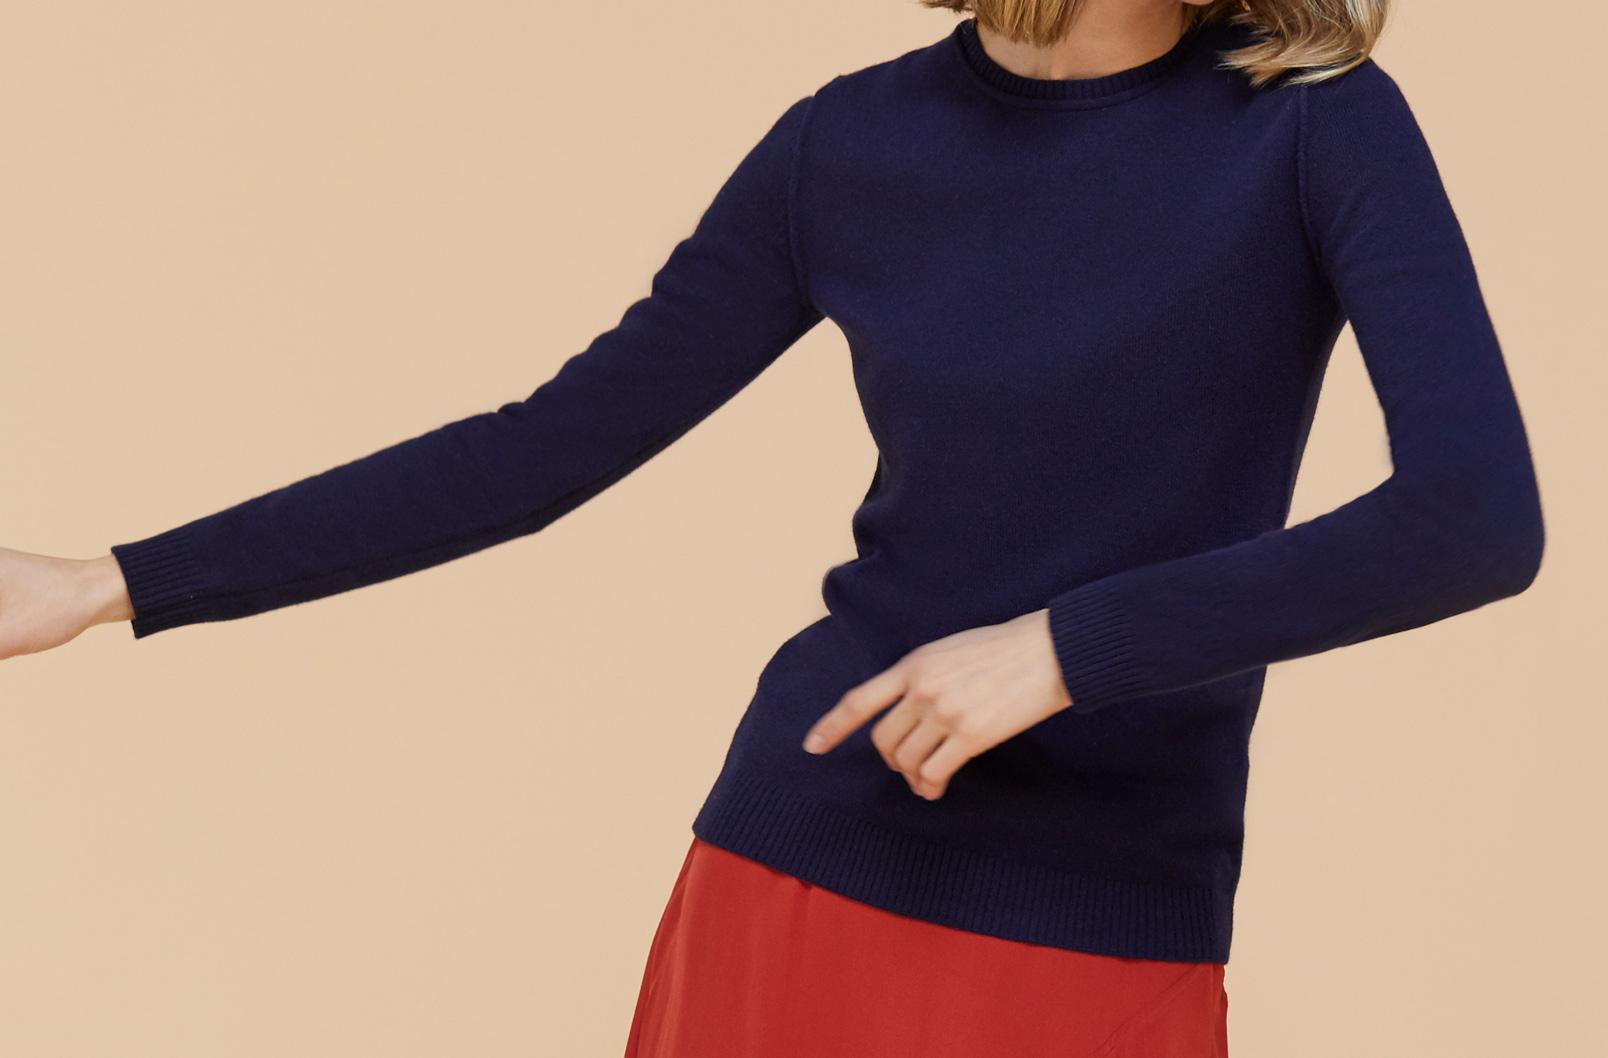 Wool Cashmere Slim Crewneck Sweater on model dancing